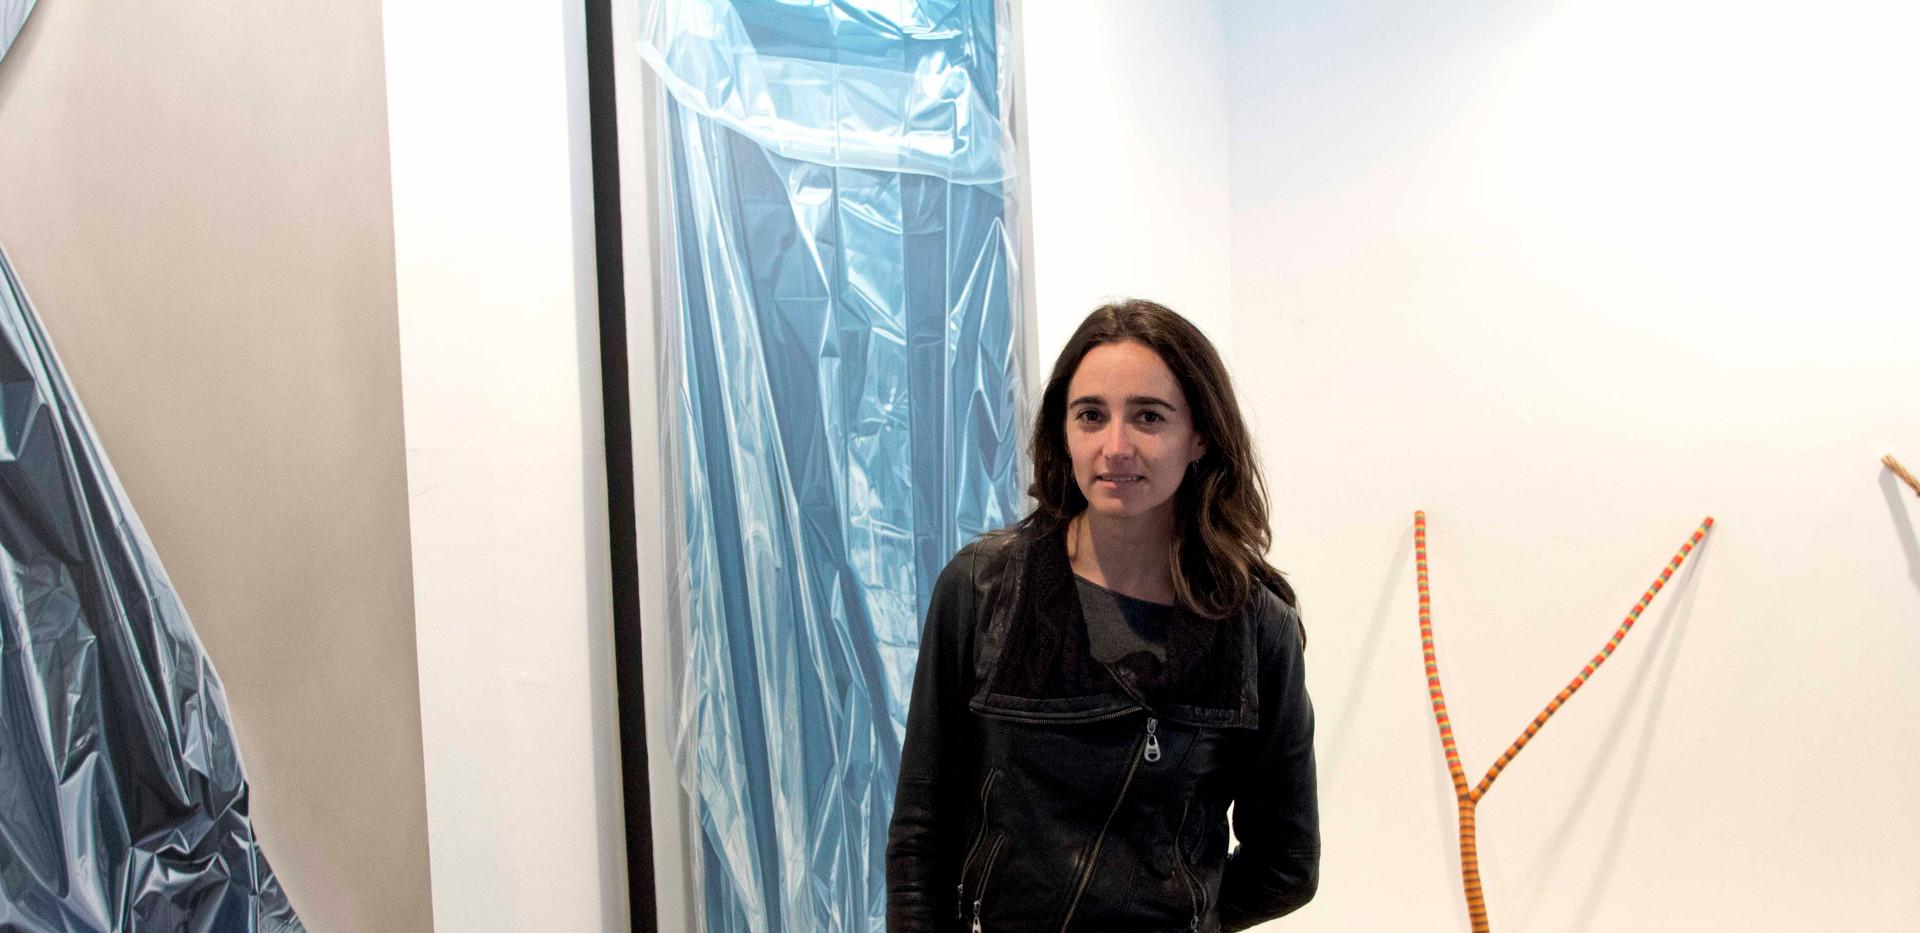 XS, Anita Jorquera.JPG